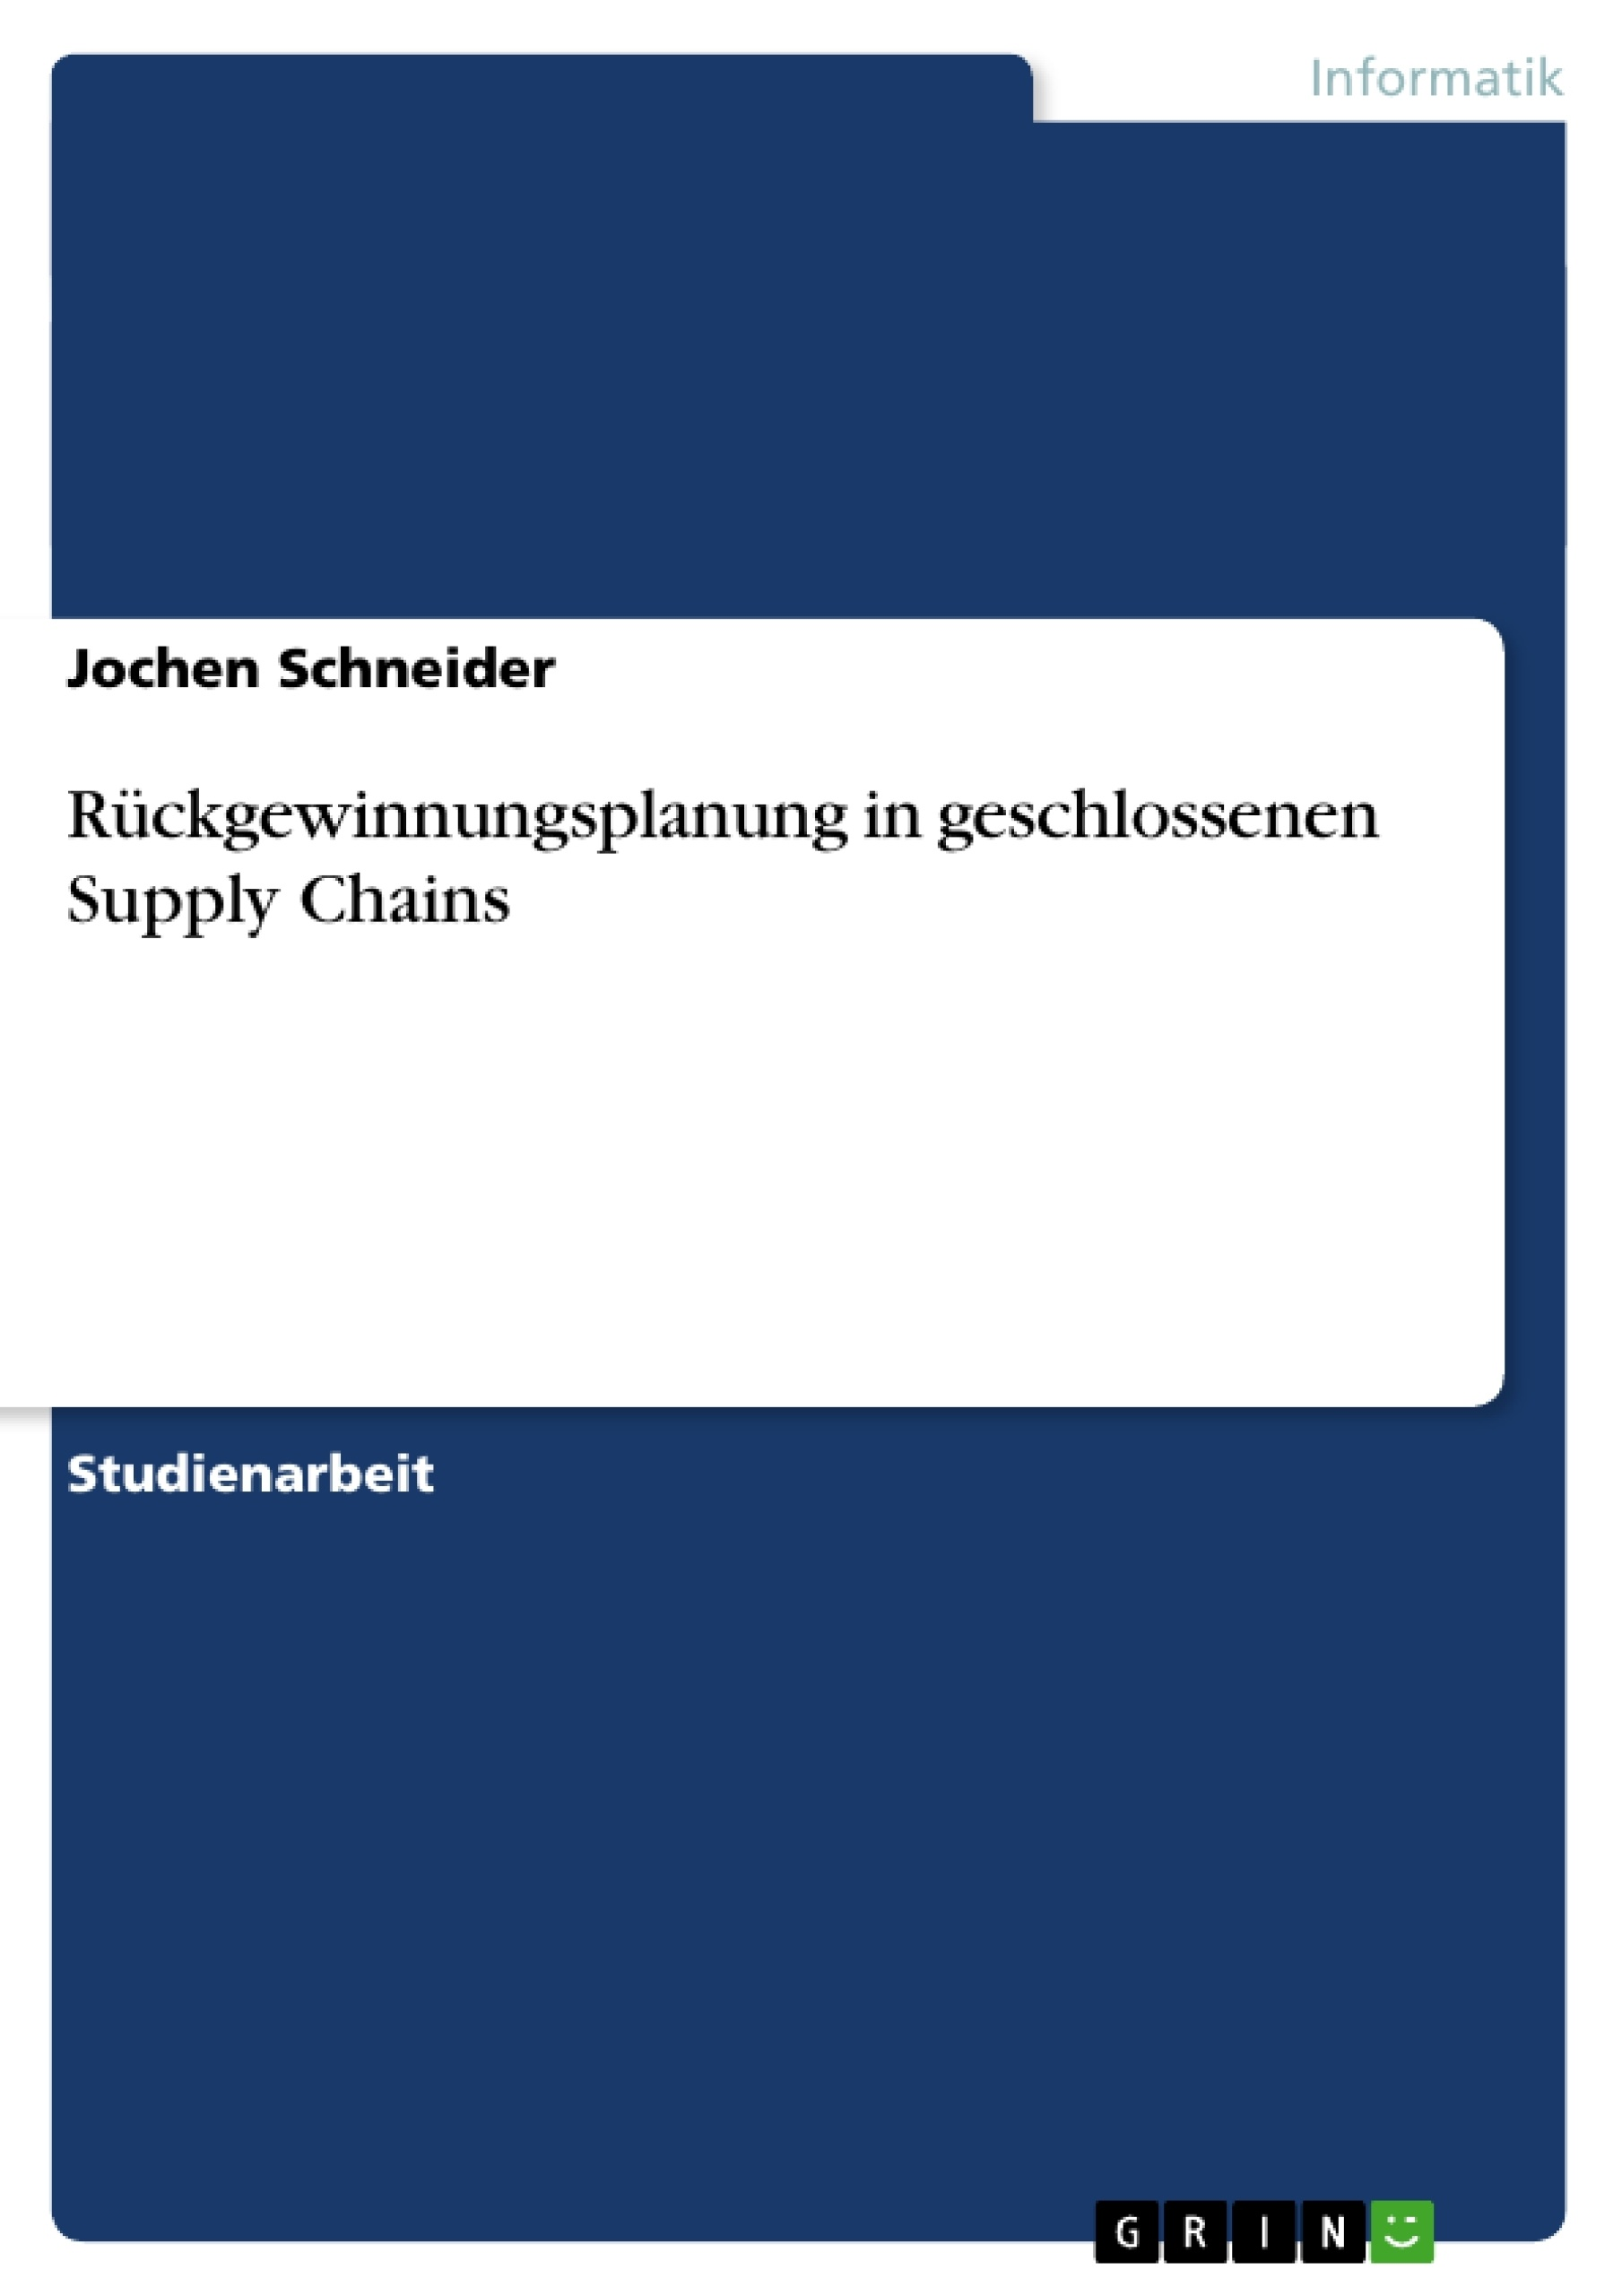 Titel: Rückgewinnungsplanung in geschlossenen Supply Chains